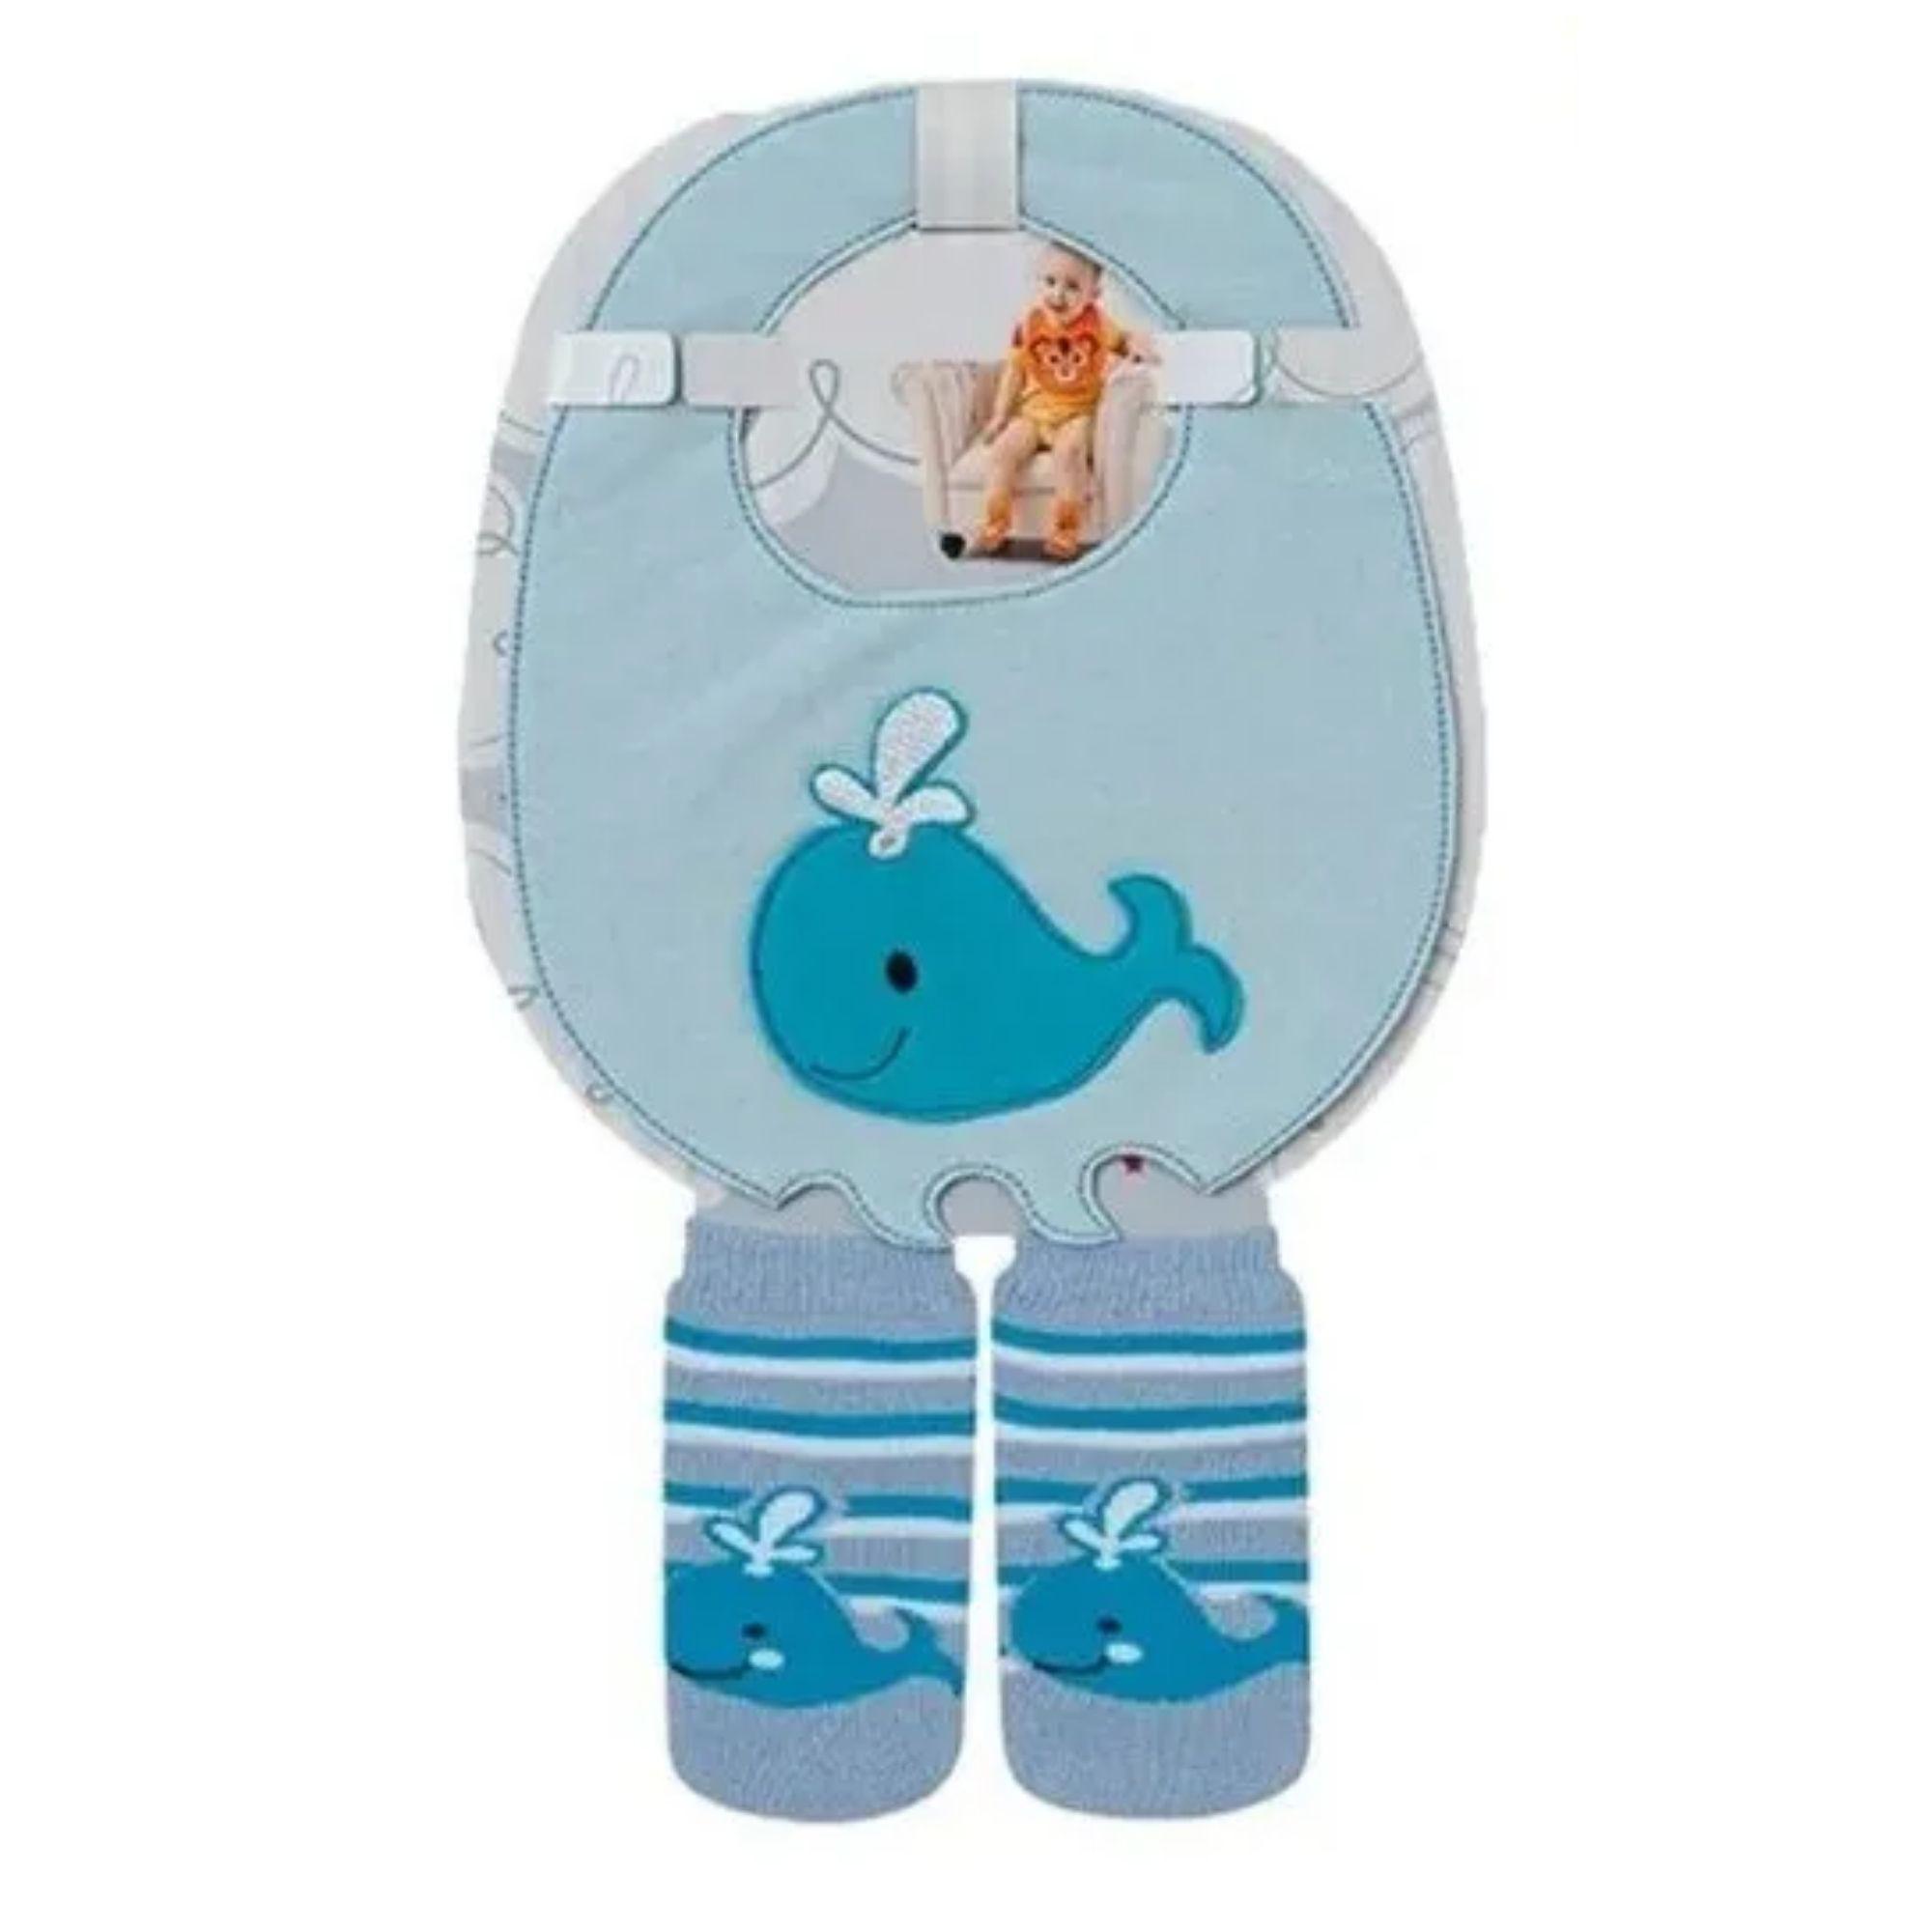 Kit Babador + meia para bebê mesma estampa 9 a 12 meses  - Game Land Brinquedos